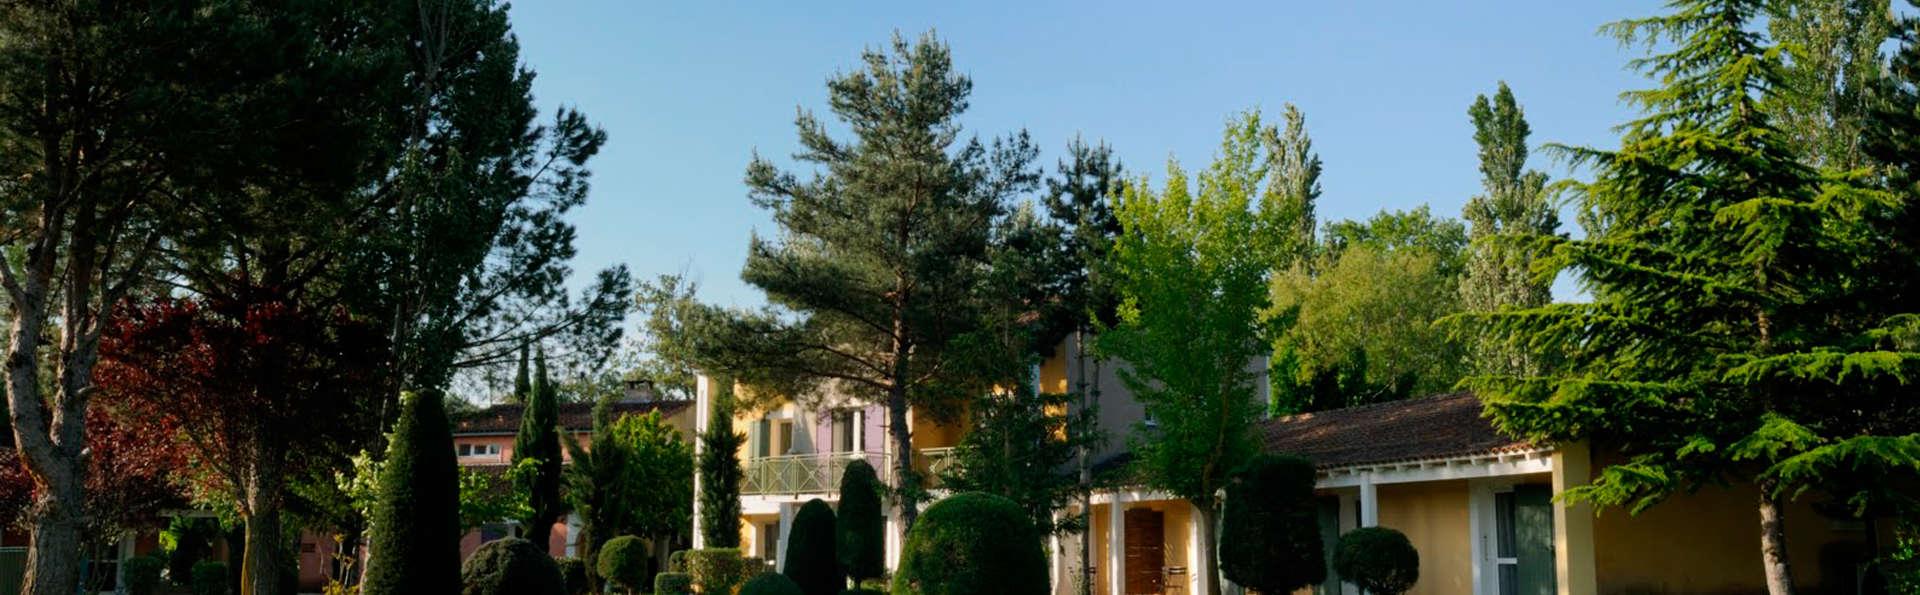 Le Domaine de la Petite Isle - Luberon - edit_garden34.jpg